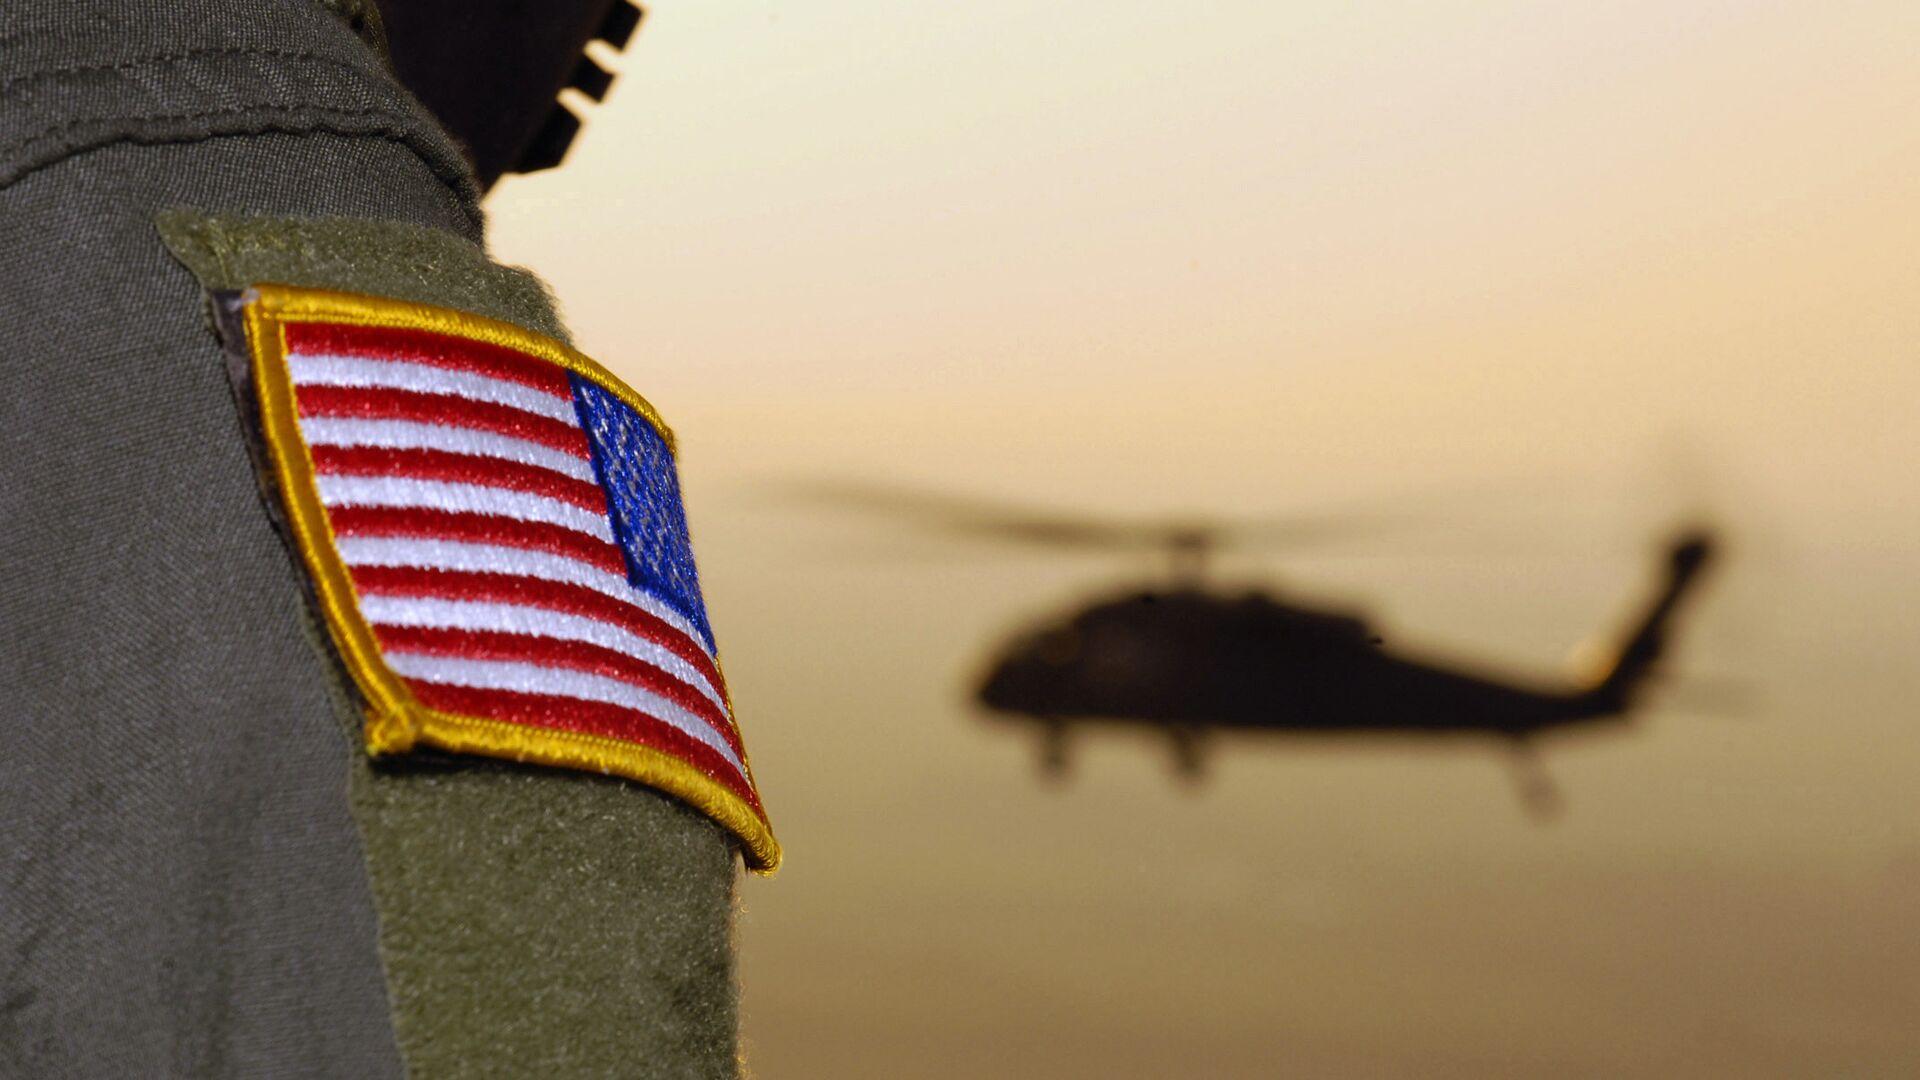 Close-up of a US Flag patch as a US Army (USA) UH-60A Black Hawk (Blackhawk) helicopter  - Sputnik Italia, 1920, 29.06.2021